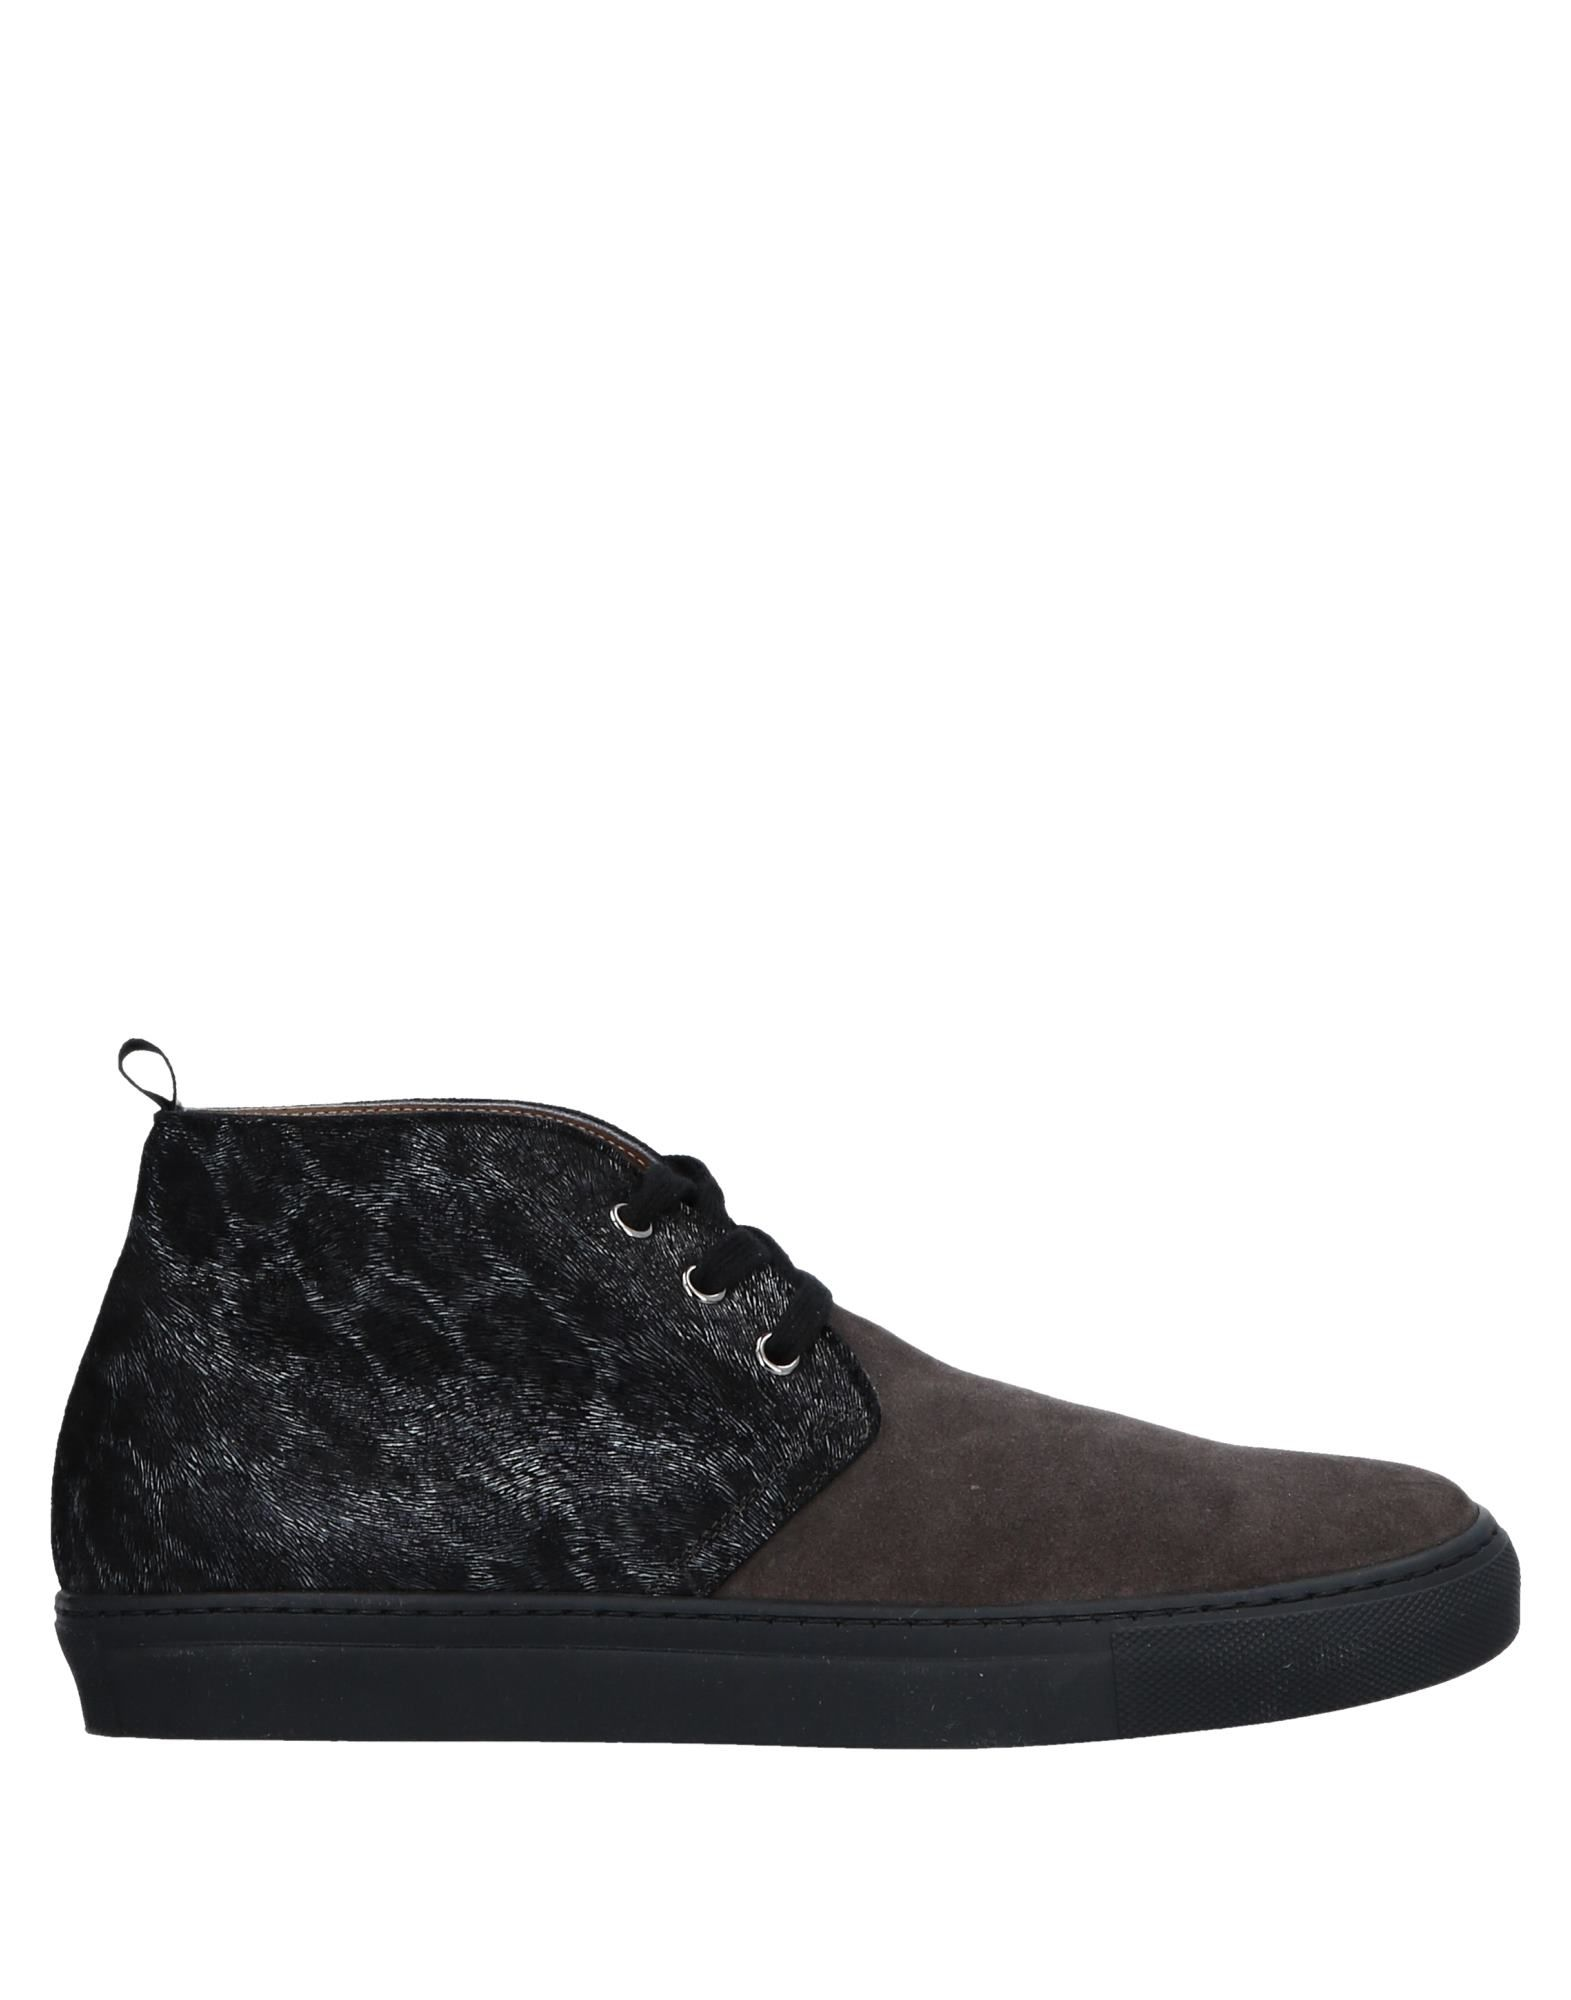 Rabatt echte  Schuhe Ebarrito Stiefelette Herren  echte 11521307WS 3d2d82